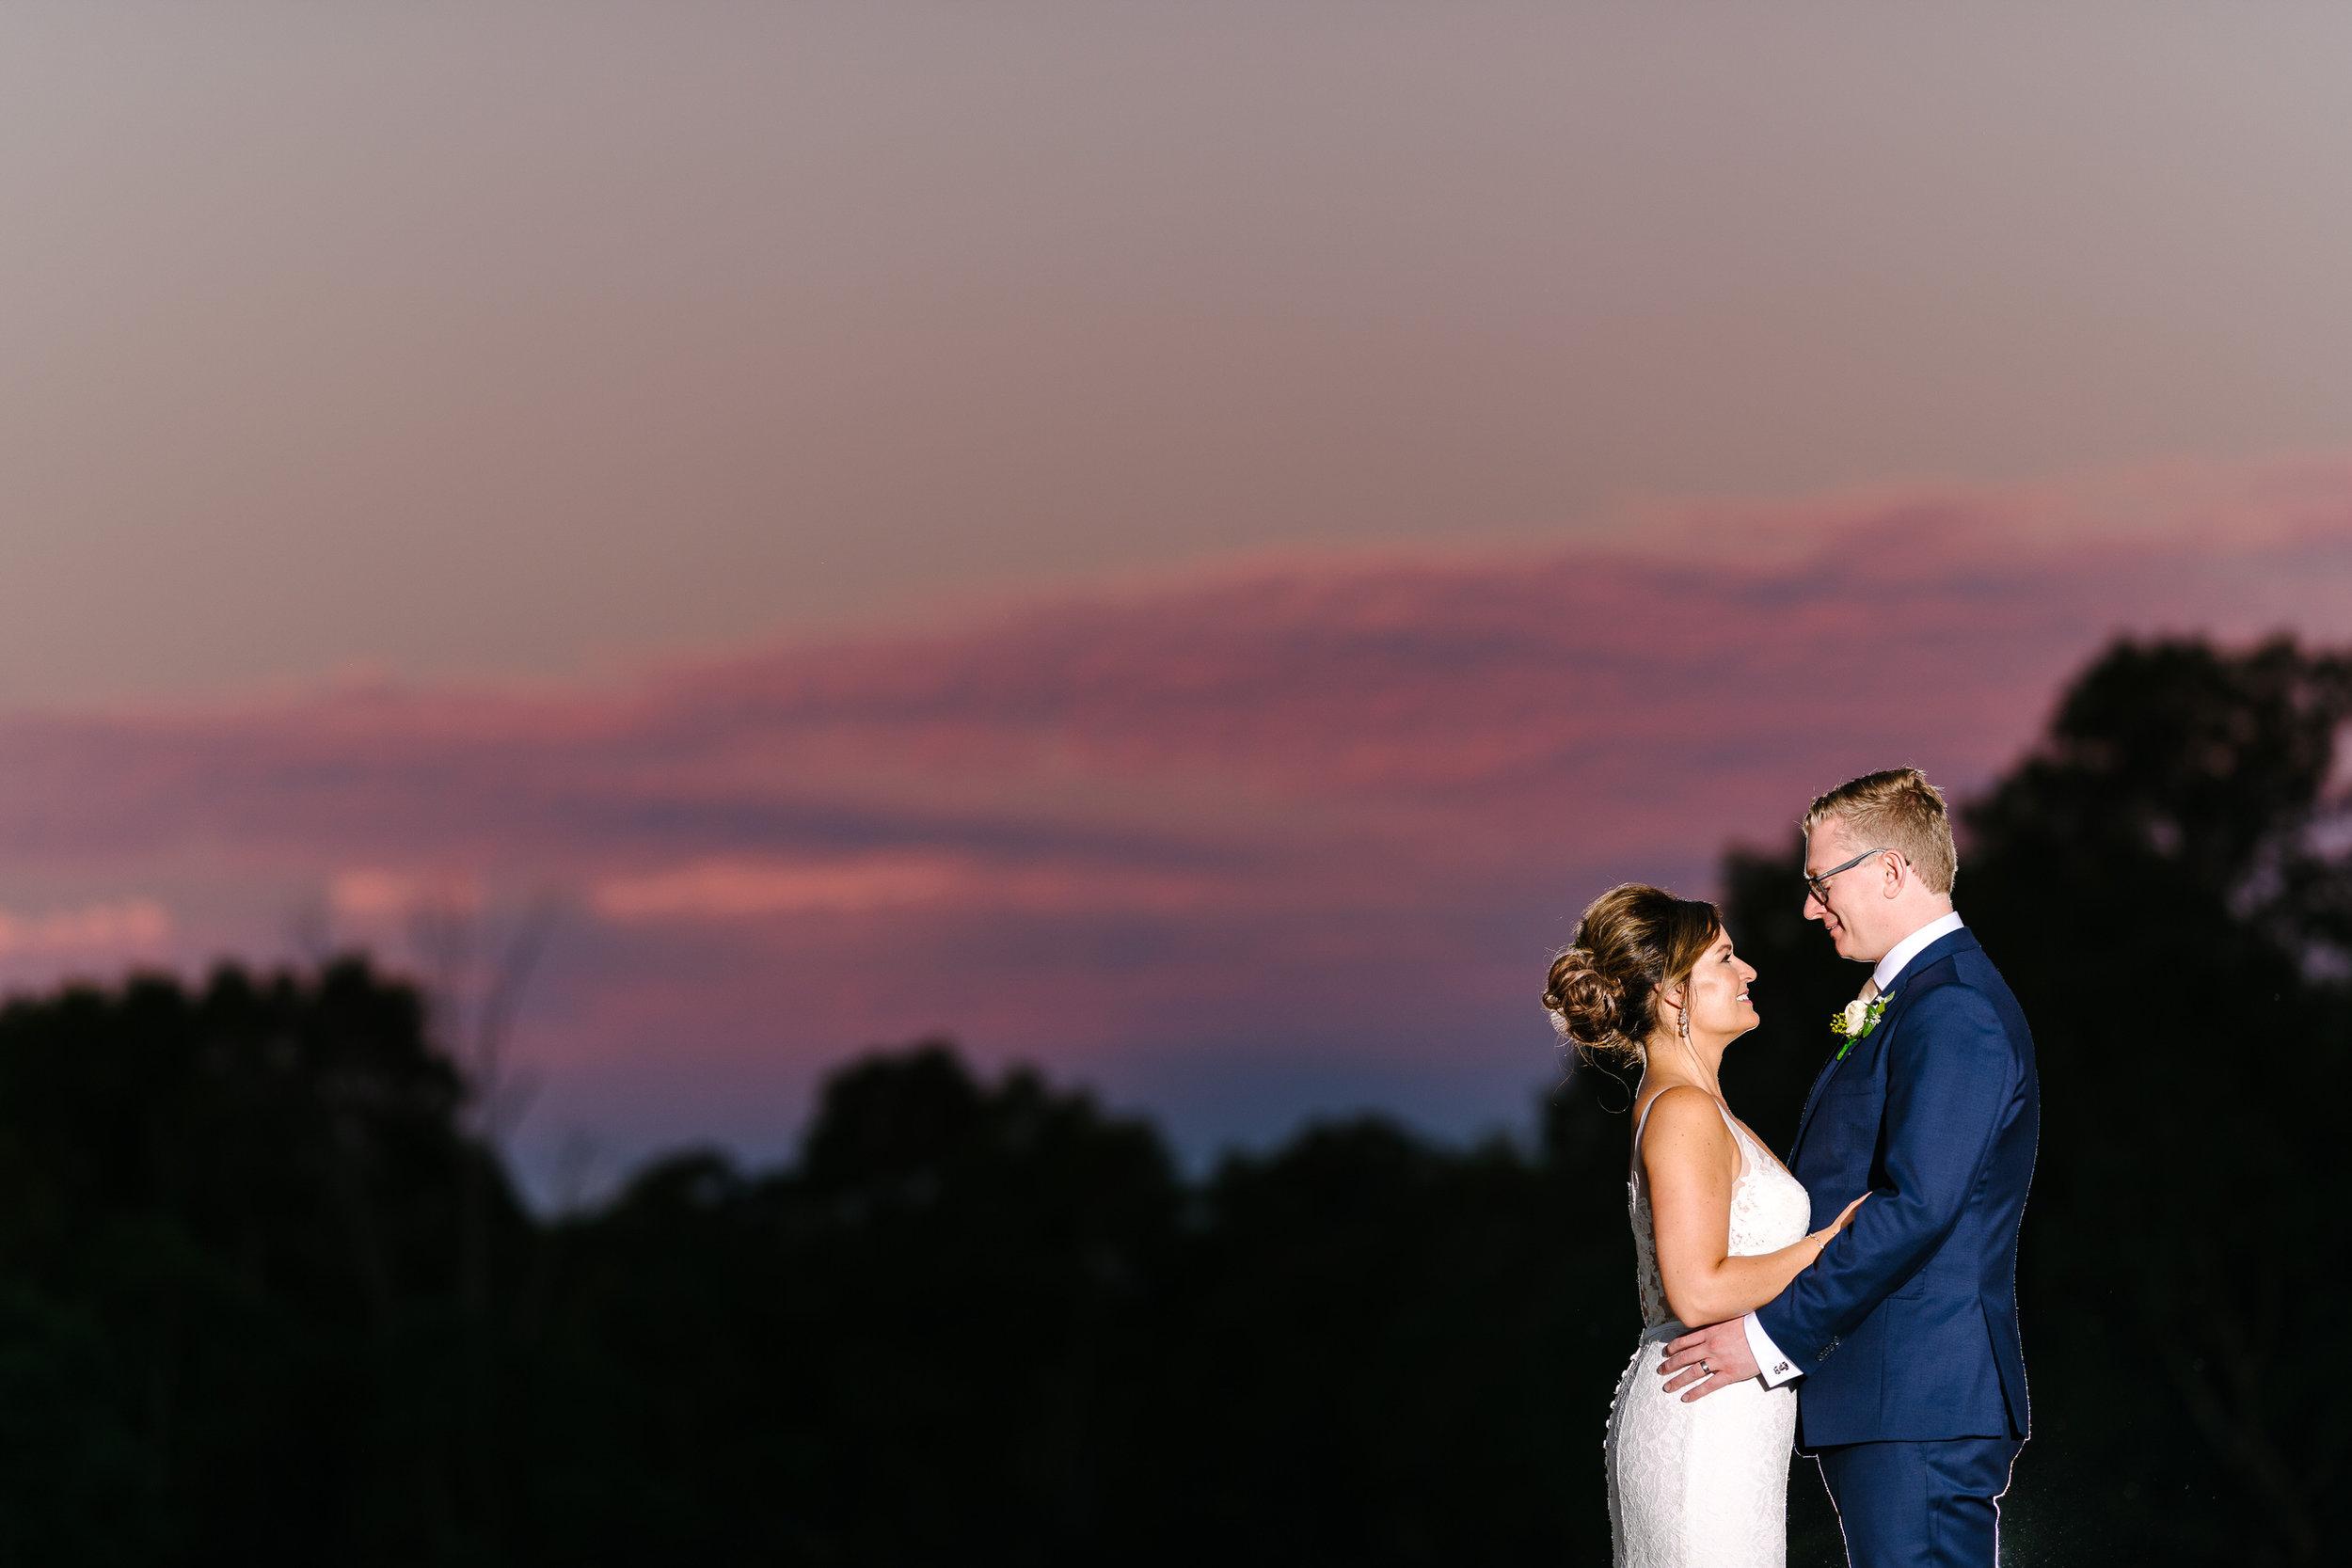 Justin_And_Jim_Photography_Chateau_Dore_Bendigo_Wedding80.JPG